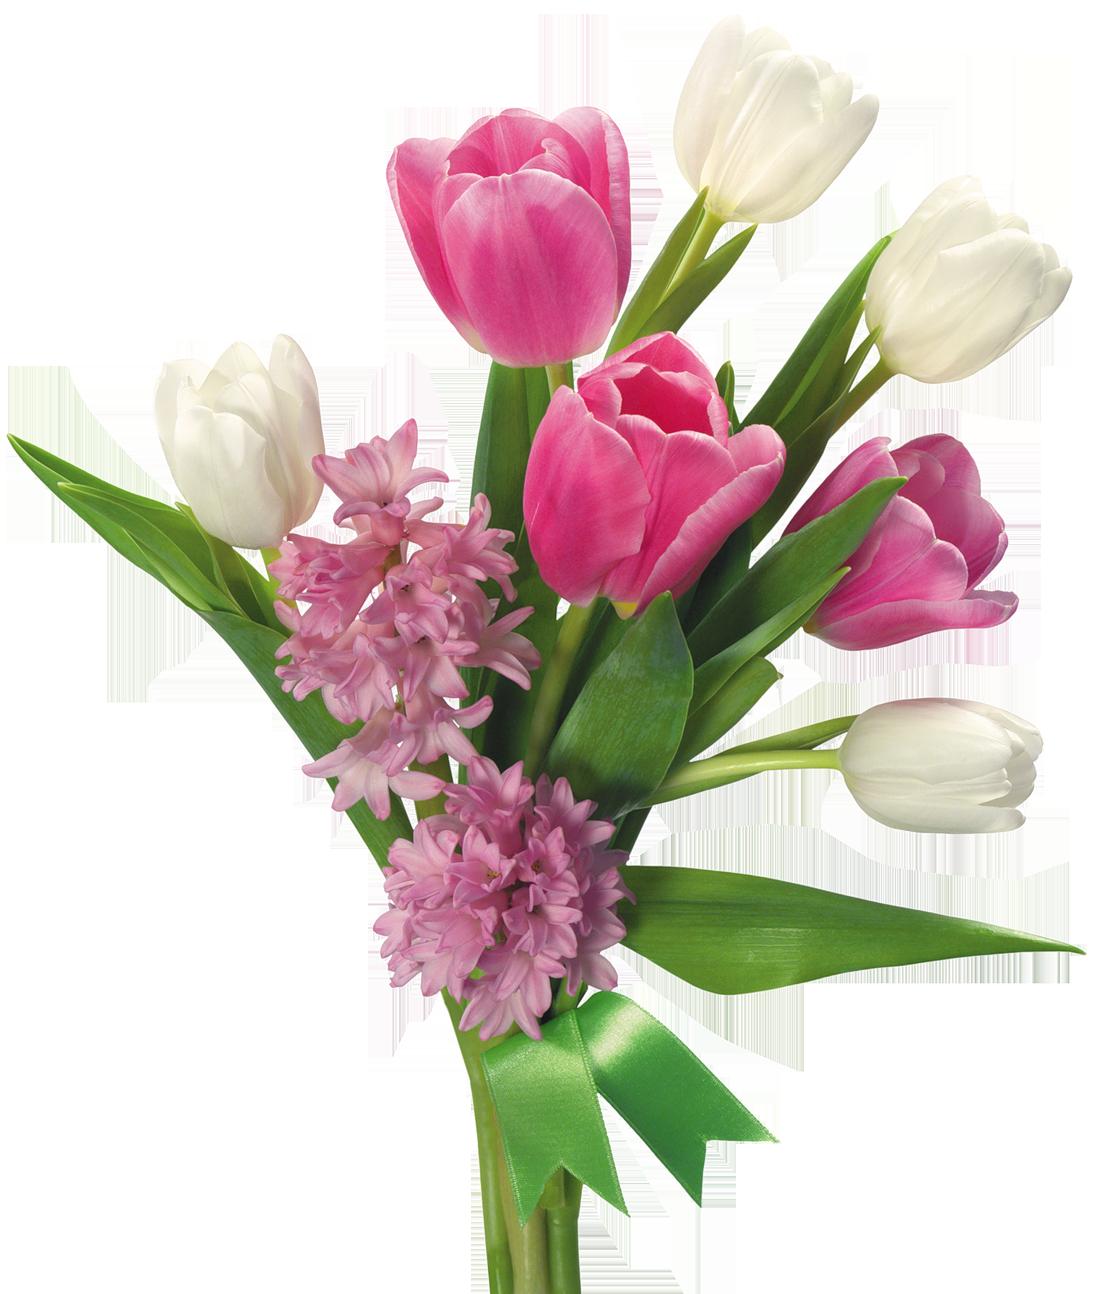 Bouquet PNG Images Transparent Free Download.